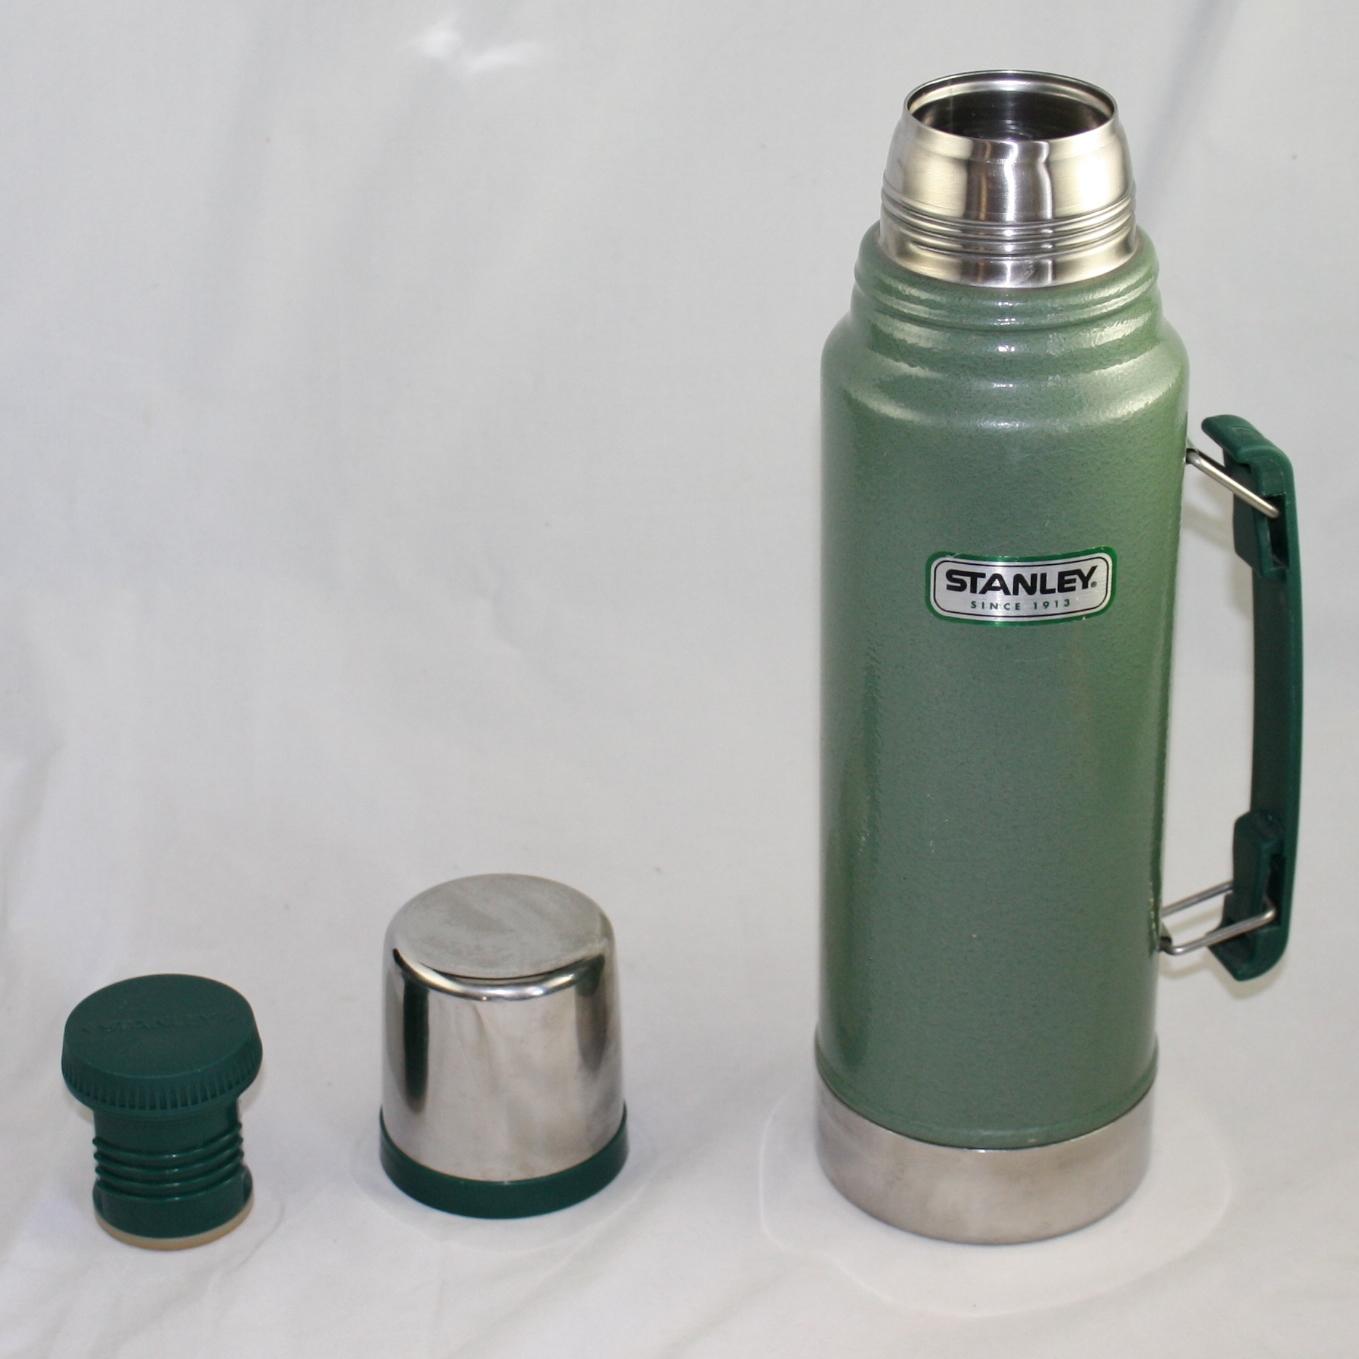 aladdin stanley stainless steel vacuum bottle thermos 1 1 qt quart 1 liter 34oz ebay. Black Bedroom Furniture Sets. Home Design Ideas